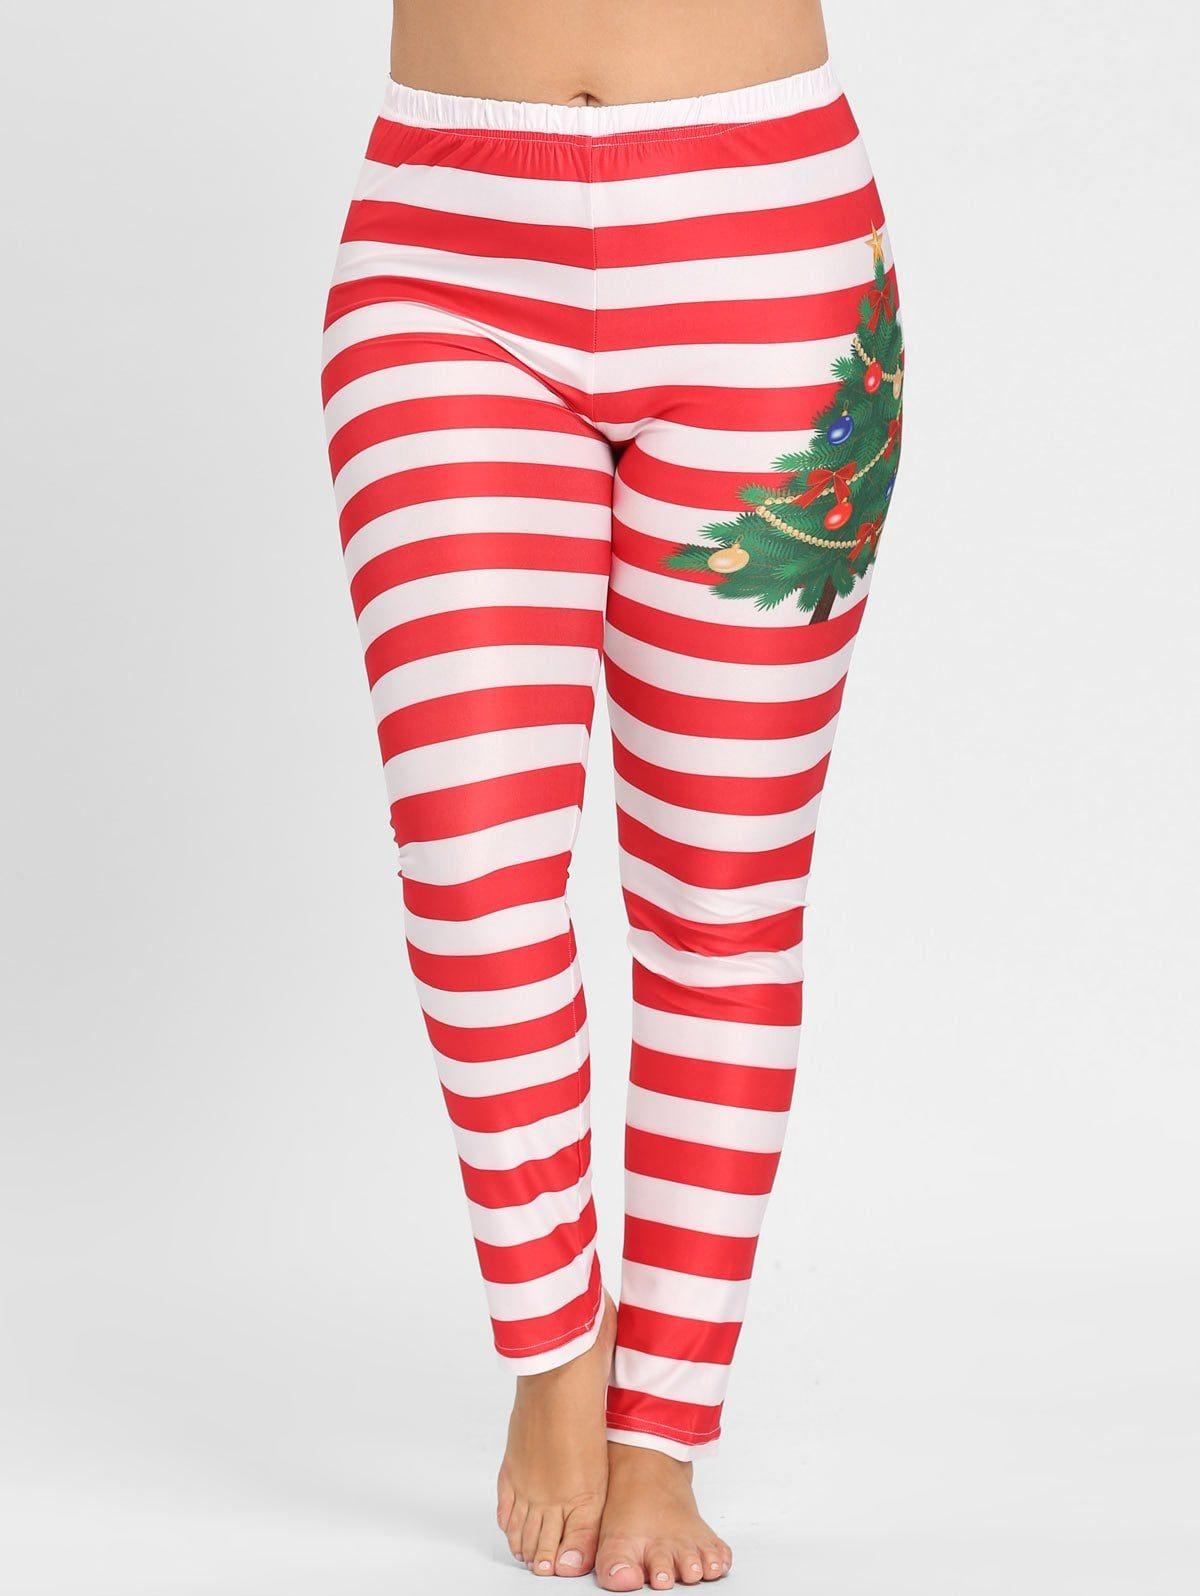 Plus Size Christmas Leggings.Plus Size Christmas Stripe Leggings Pants Fashion Outfits